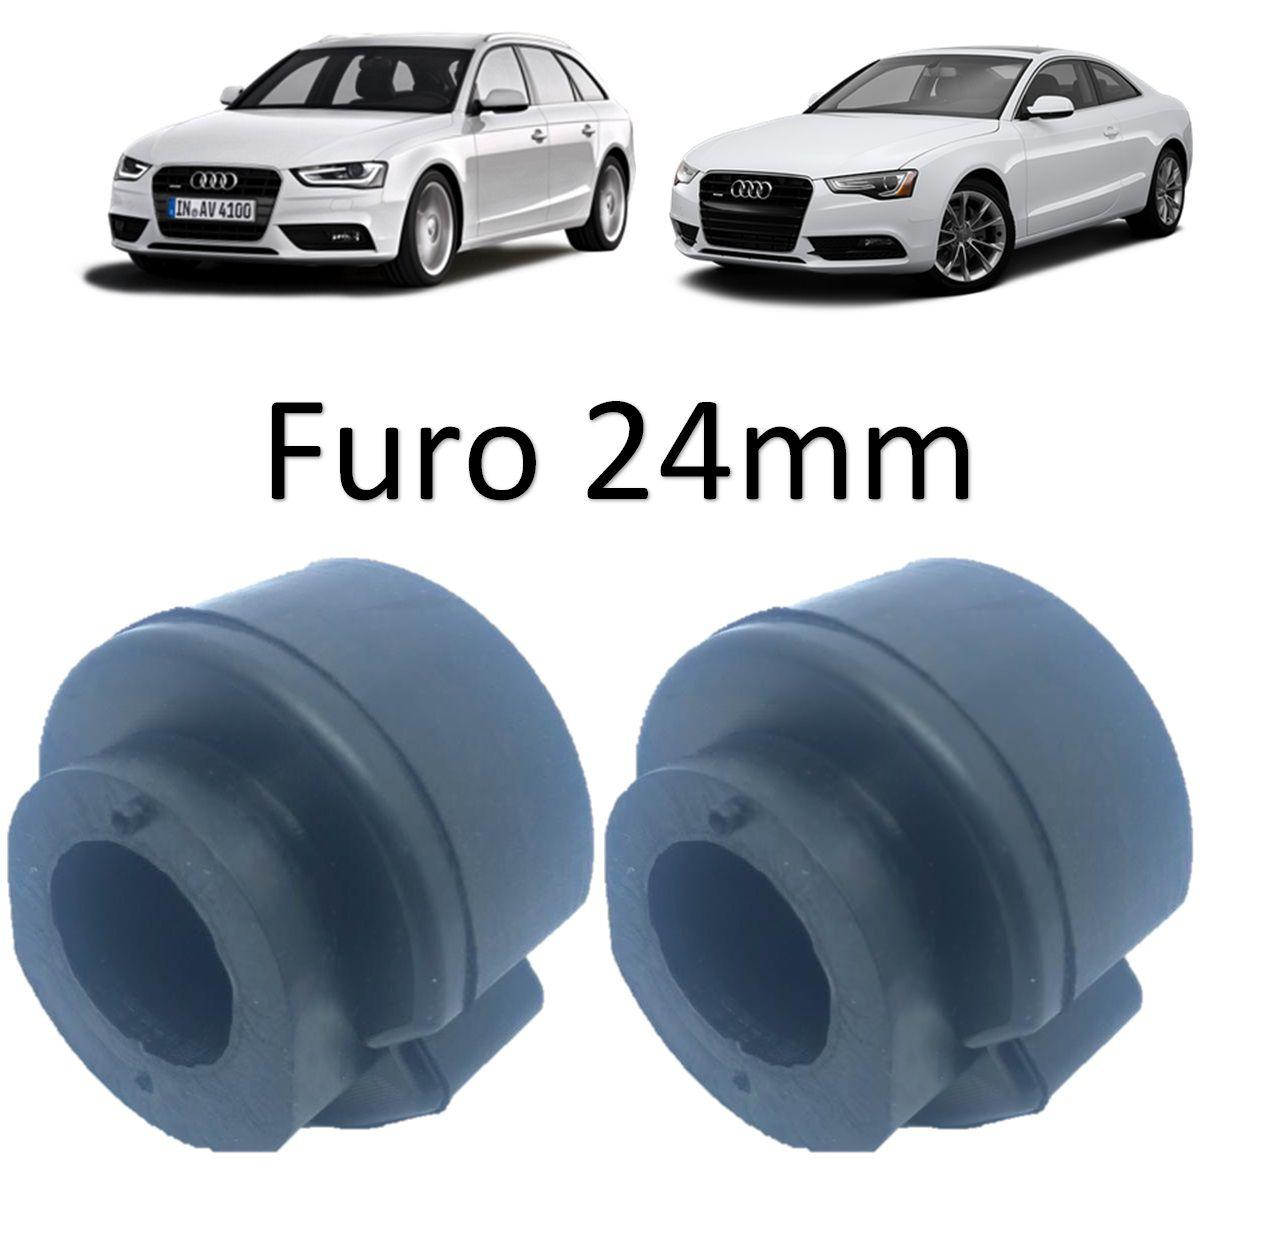 Kit Bucha Estabilizadora Dianteira Audi A4/A/ A6 1998/...Passat 97/...Audi A4/A5 2014/...A5/A6 2010/2018